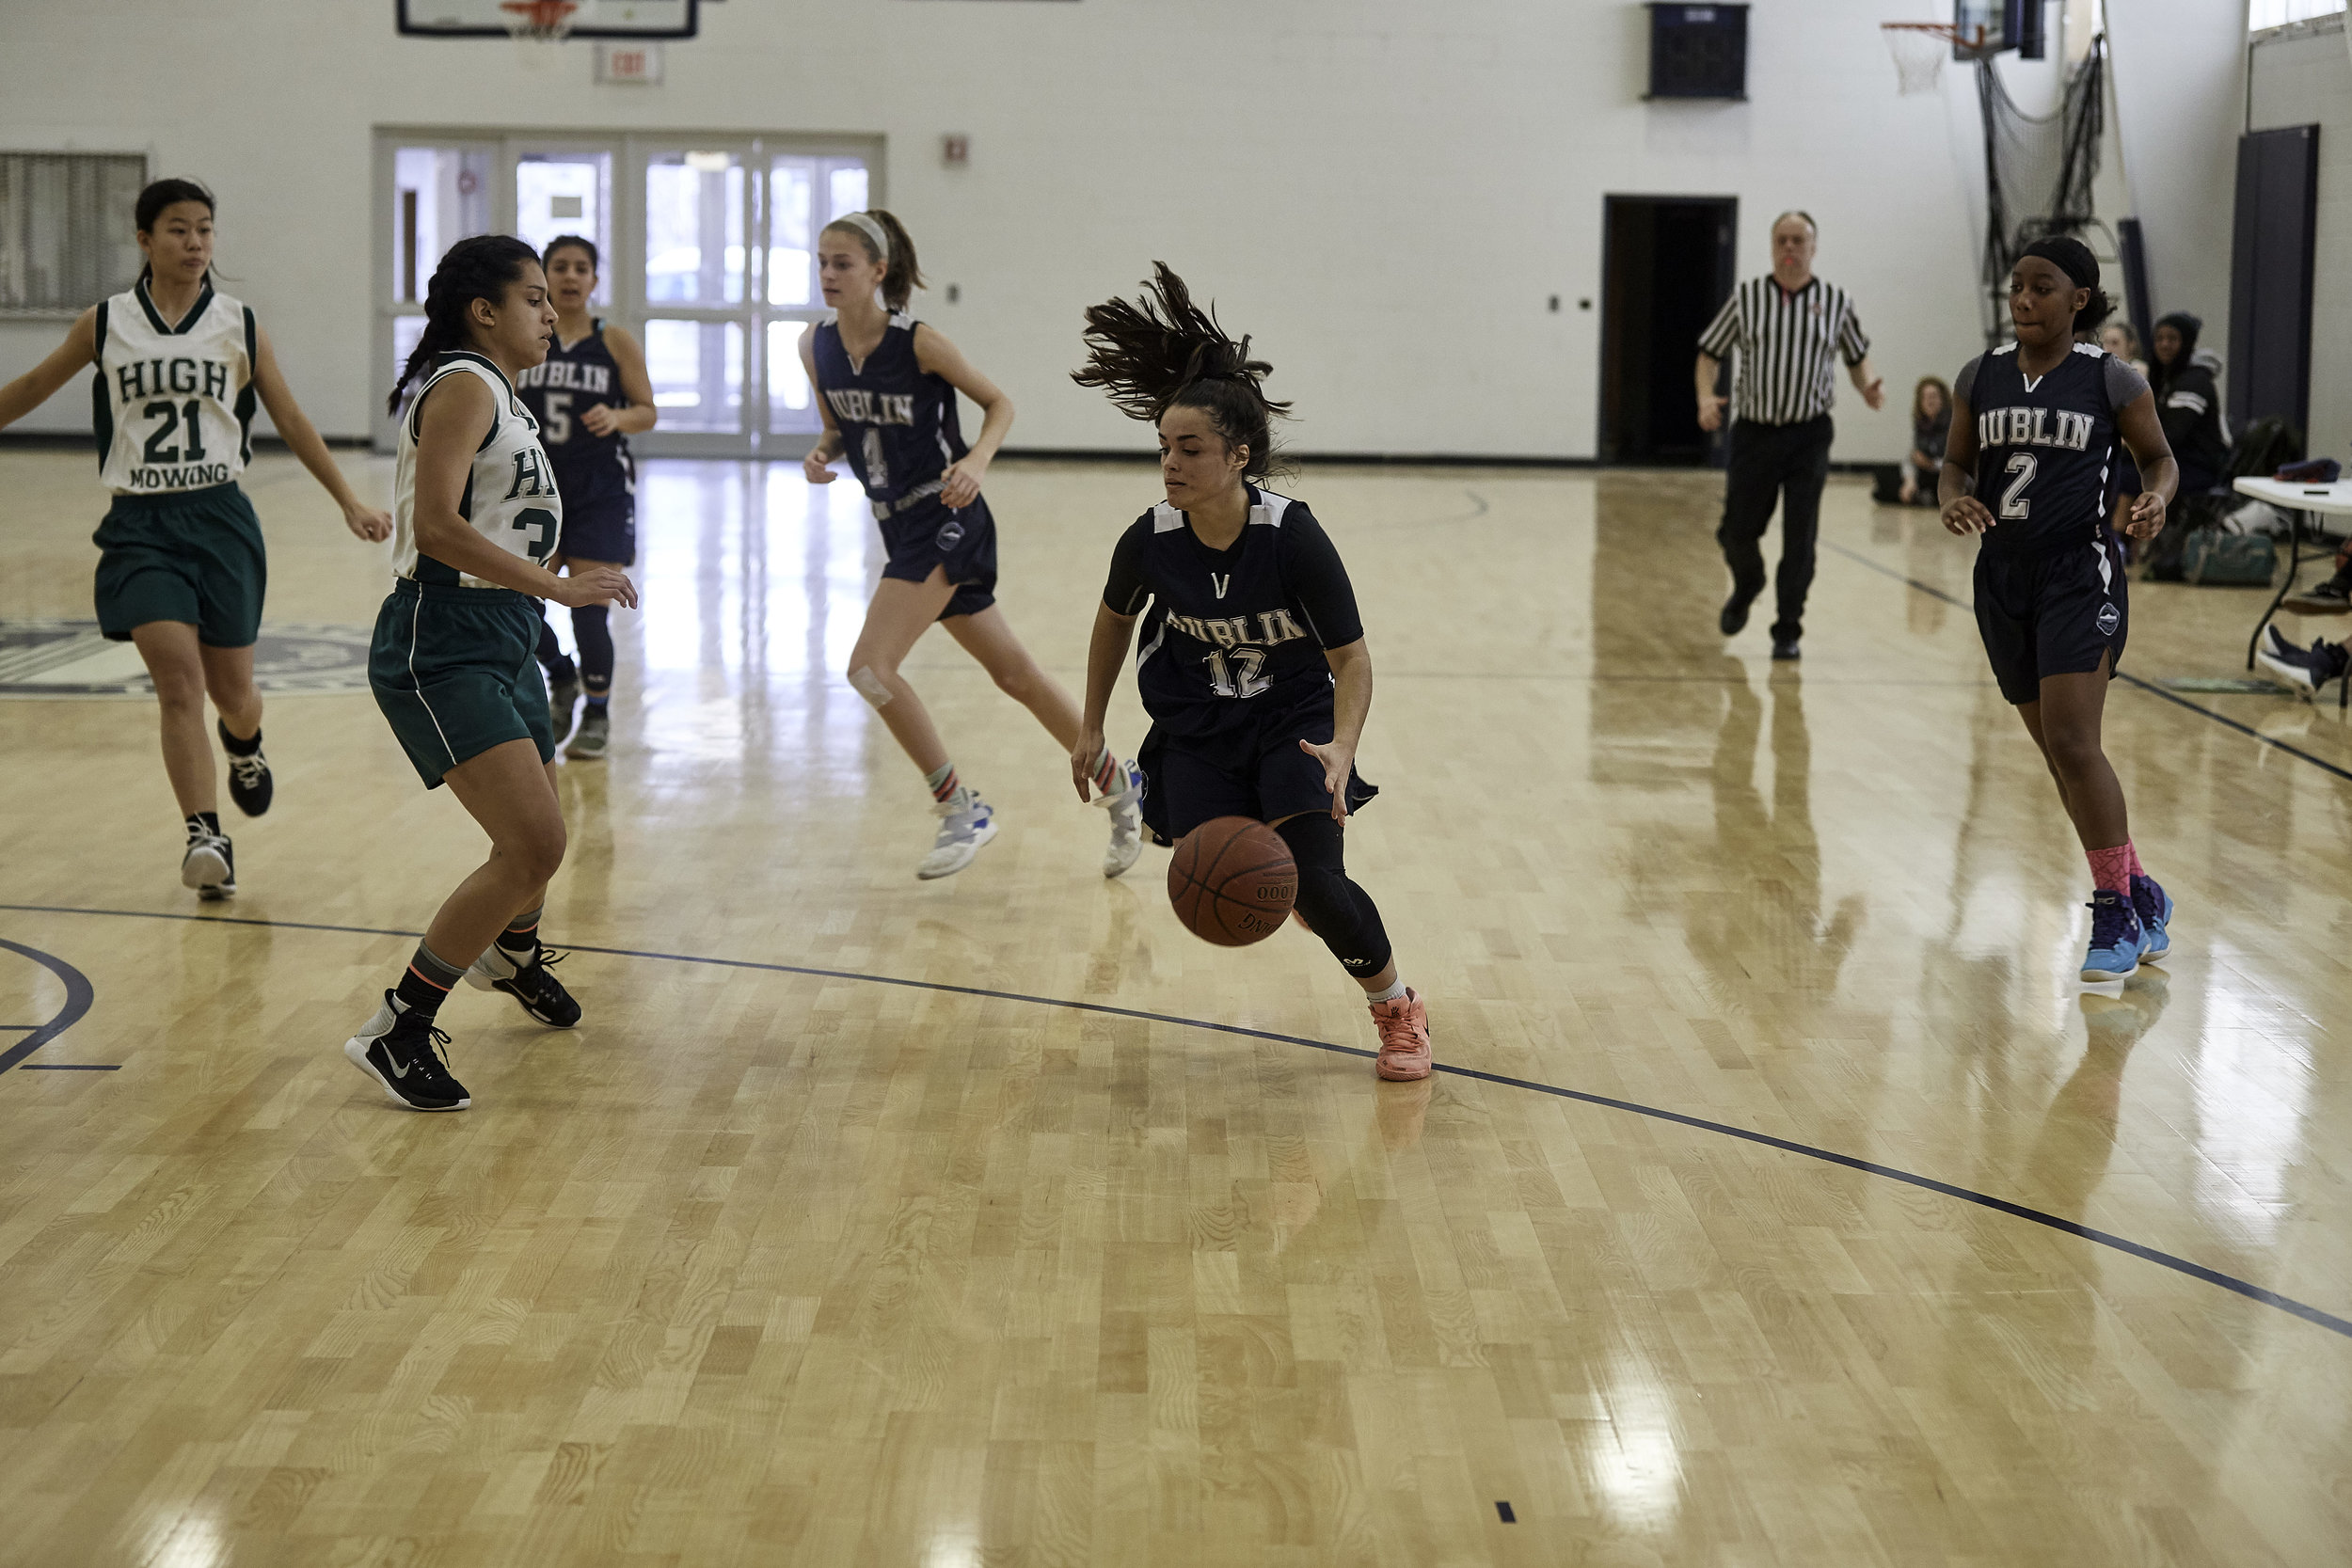 Basketball vs High Mowing School, February 2, 2019 - 166318.jpg